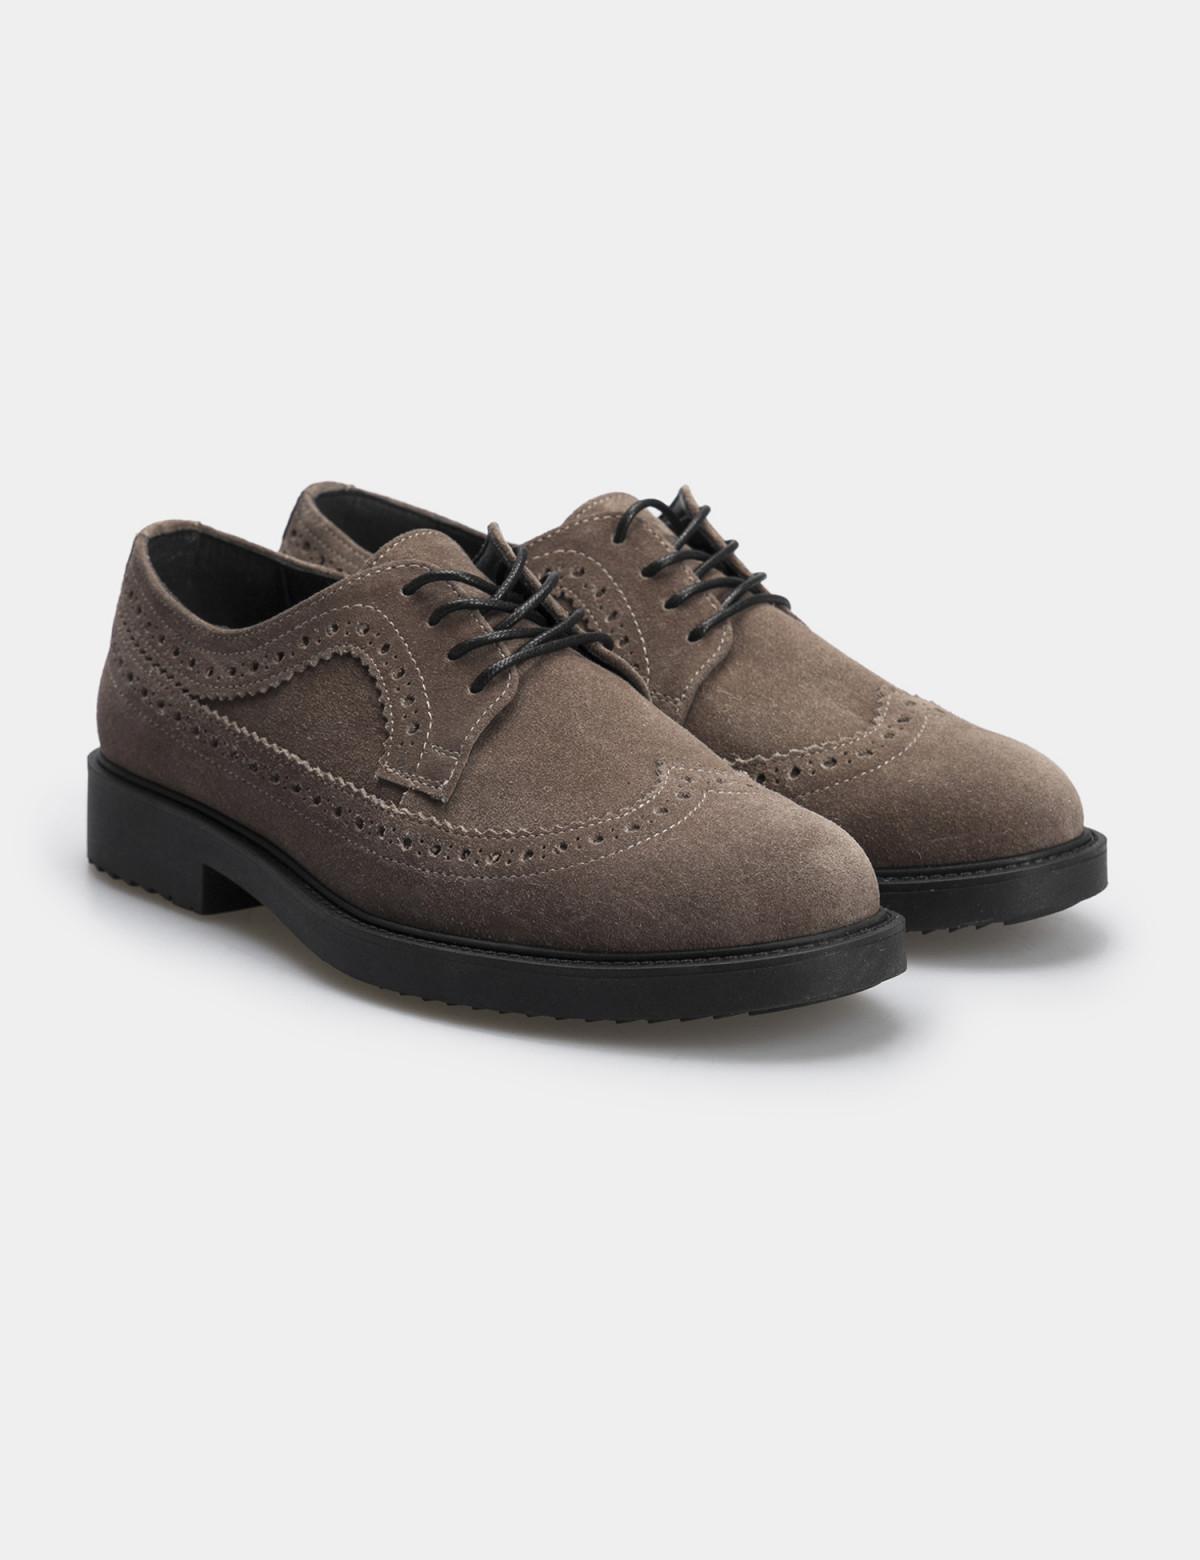 Туфлі темно-бежеві, натуральна замша1